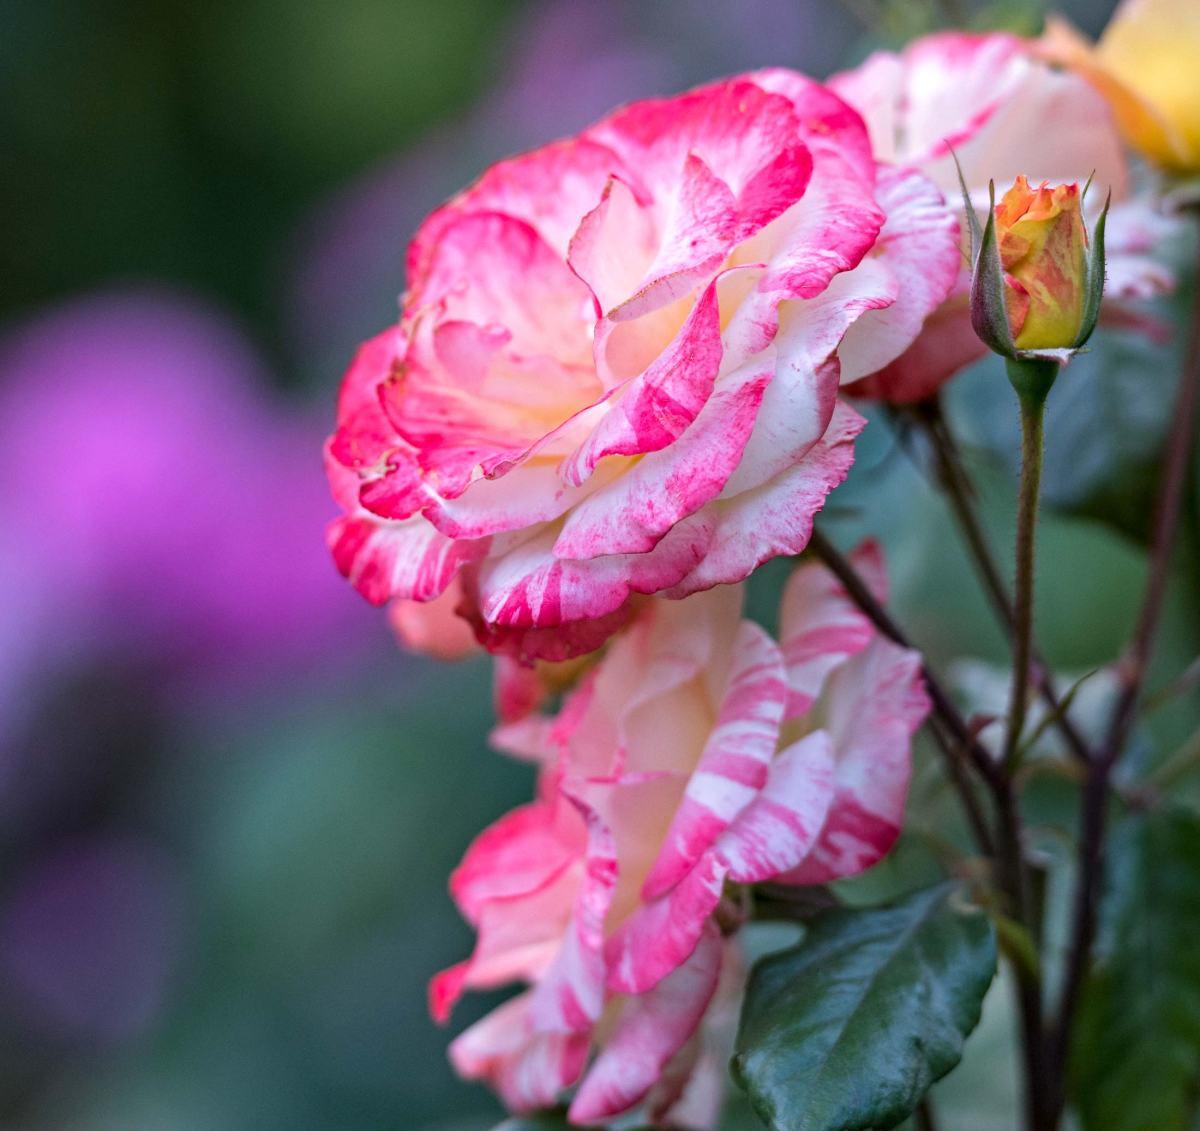 r-d_roses_810_1524